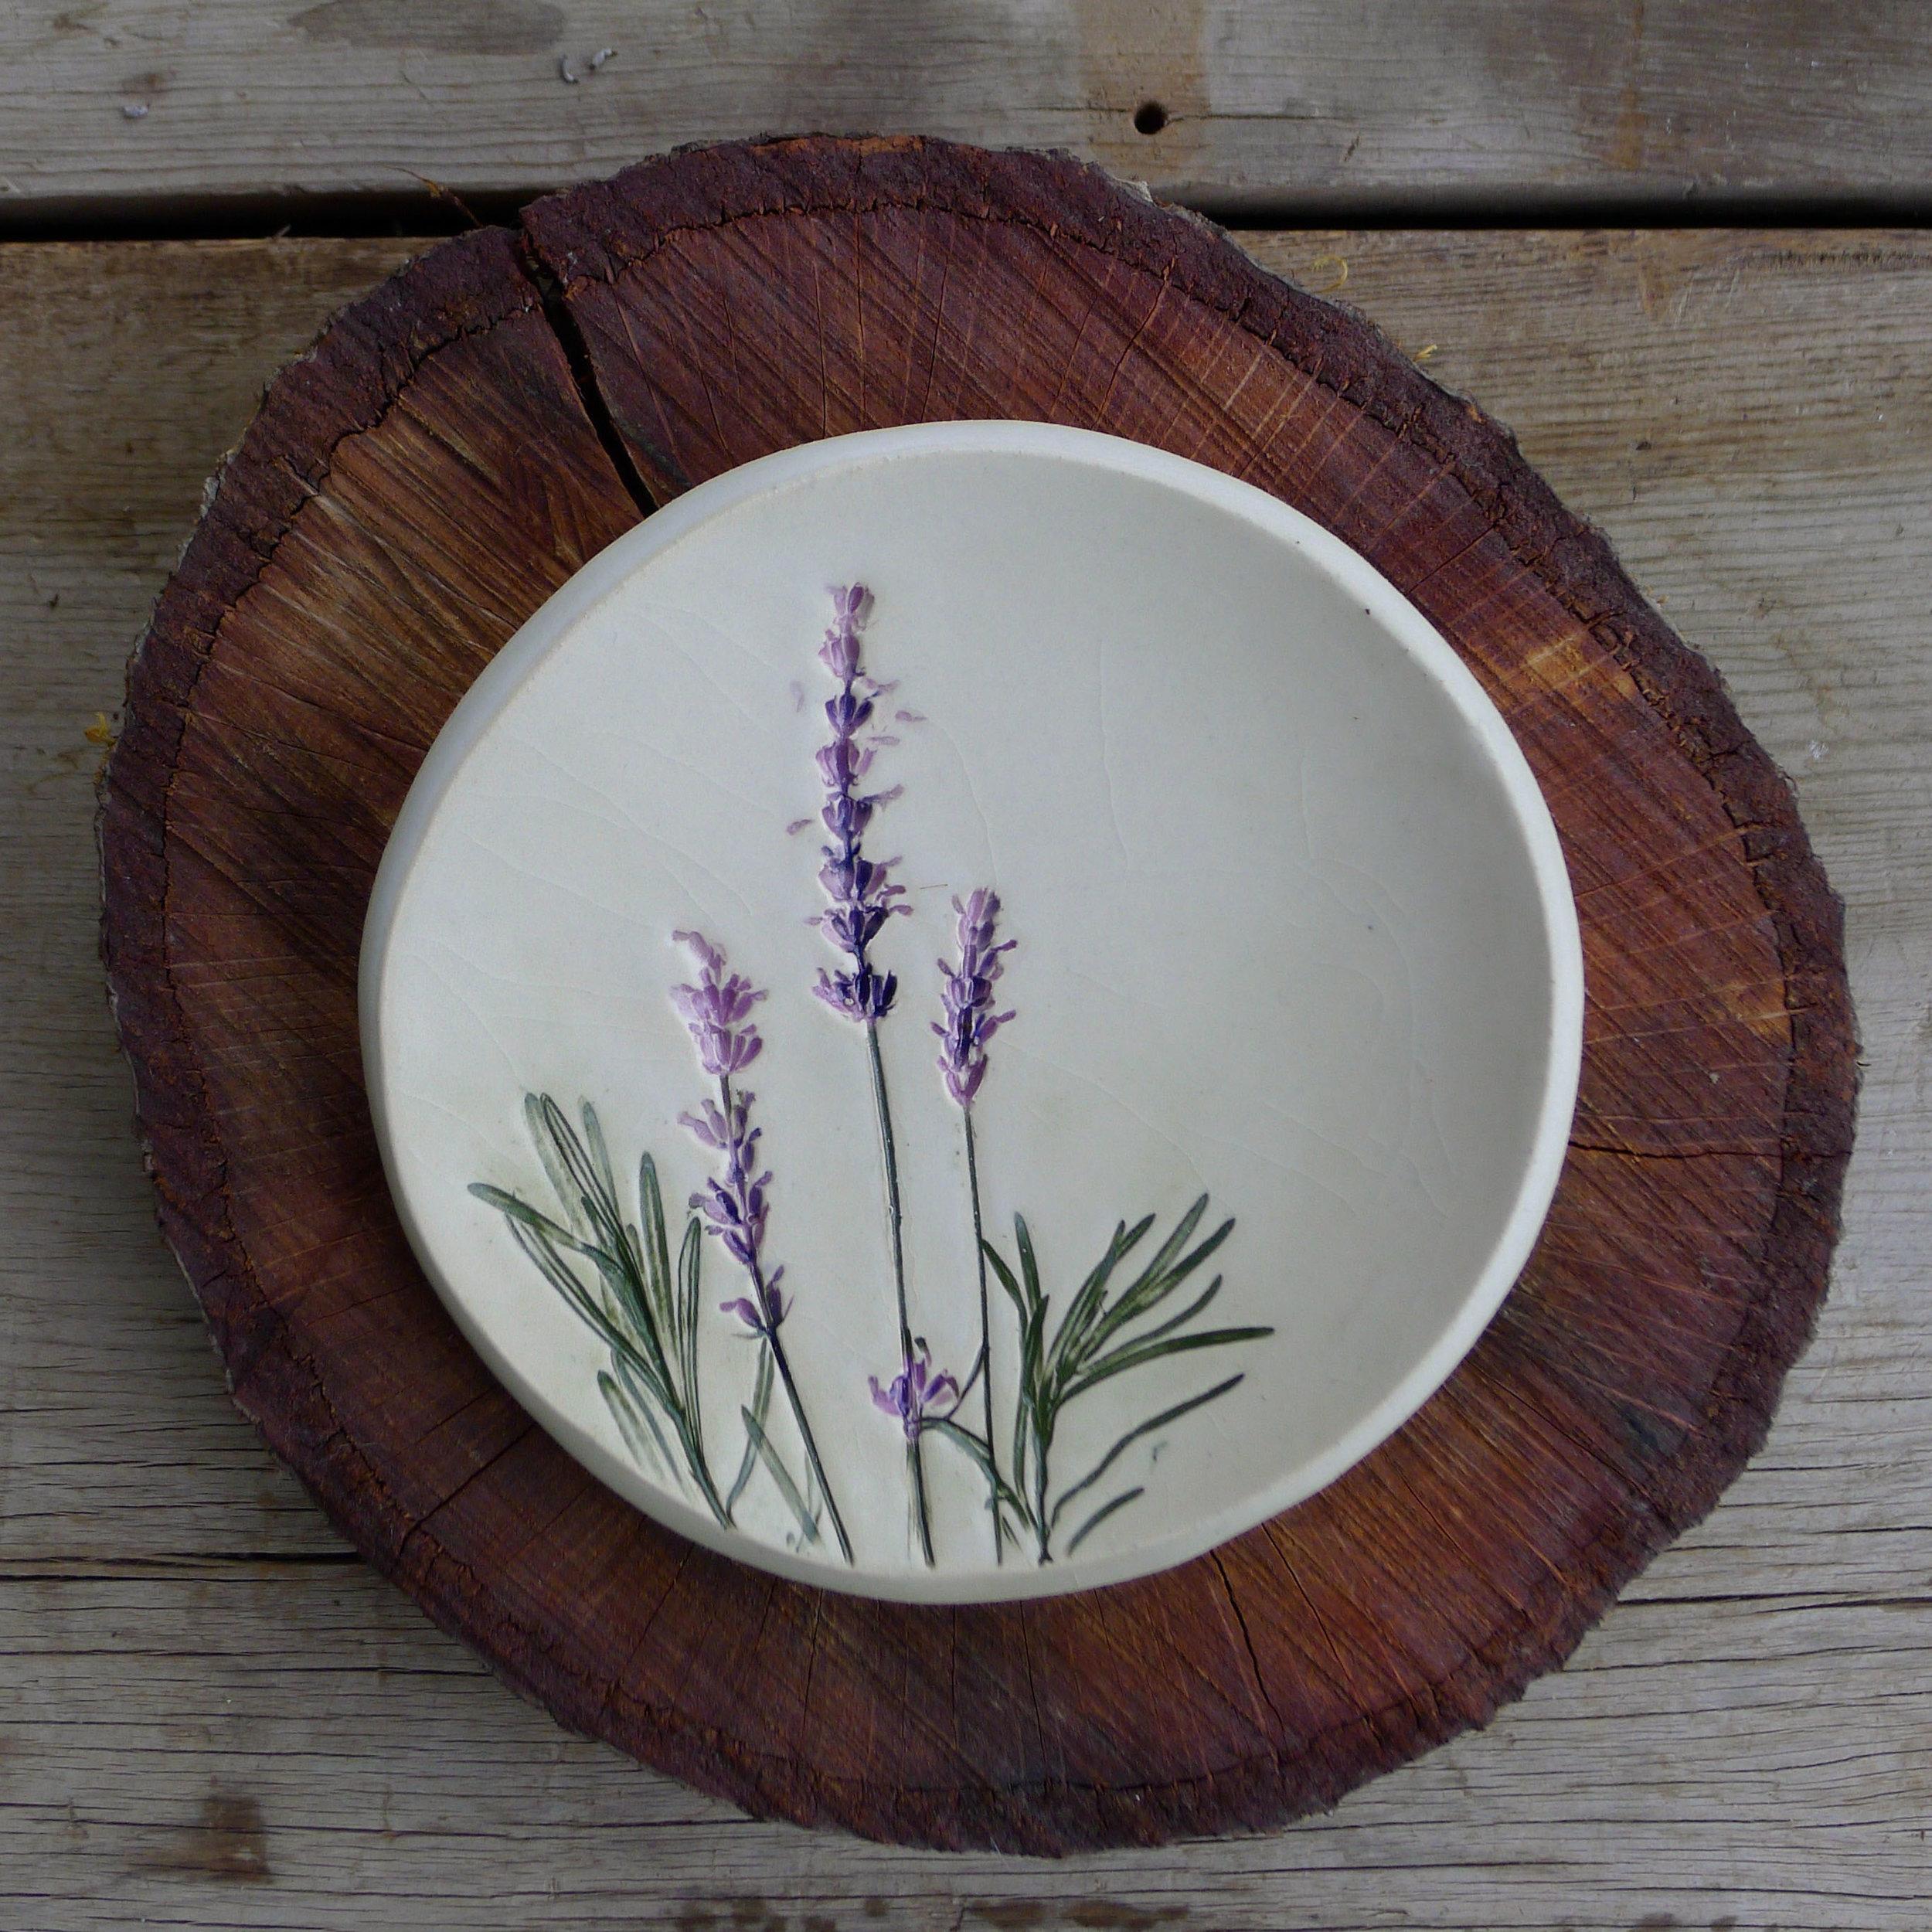 lavender plate on stump.jpg